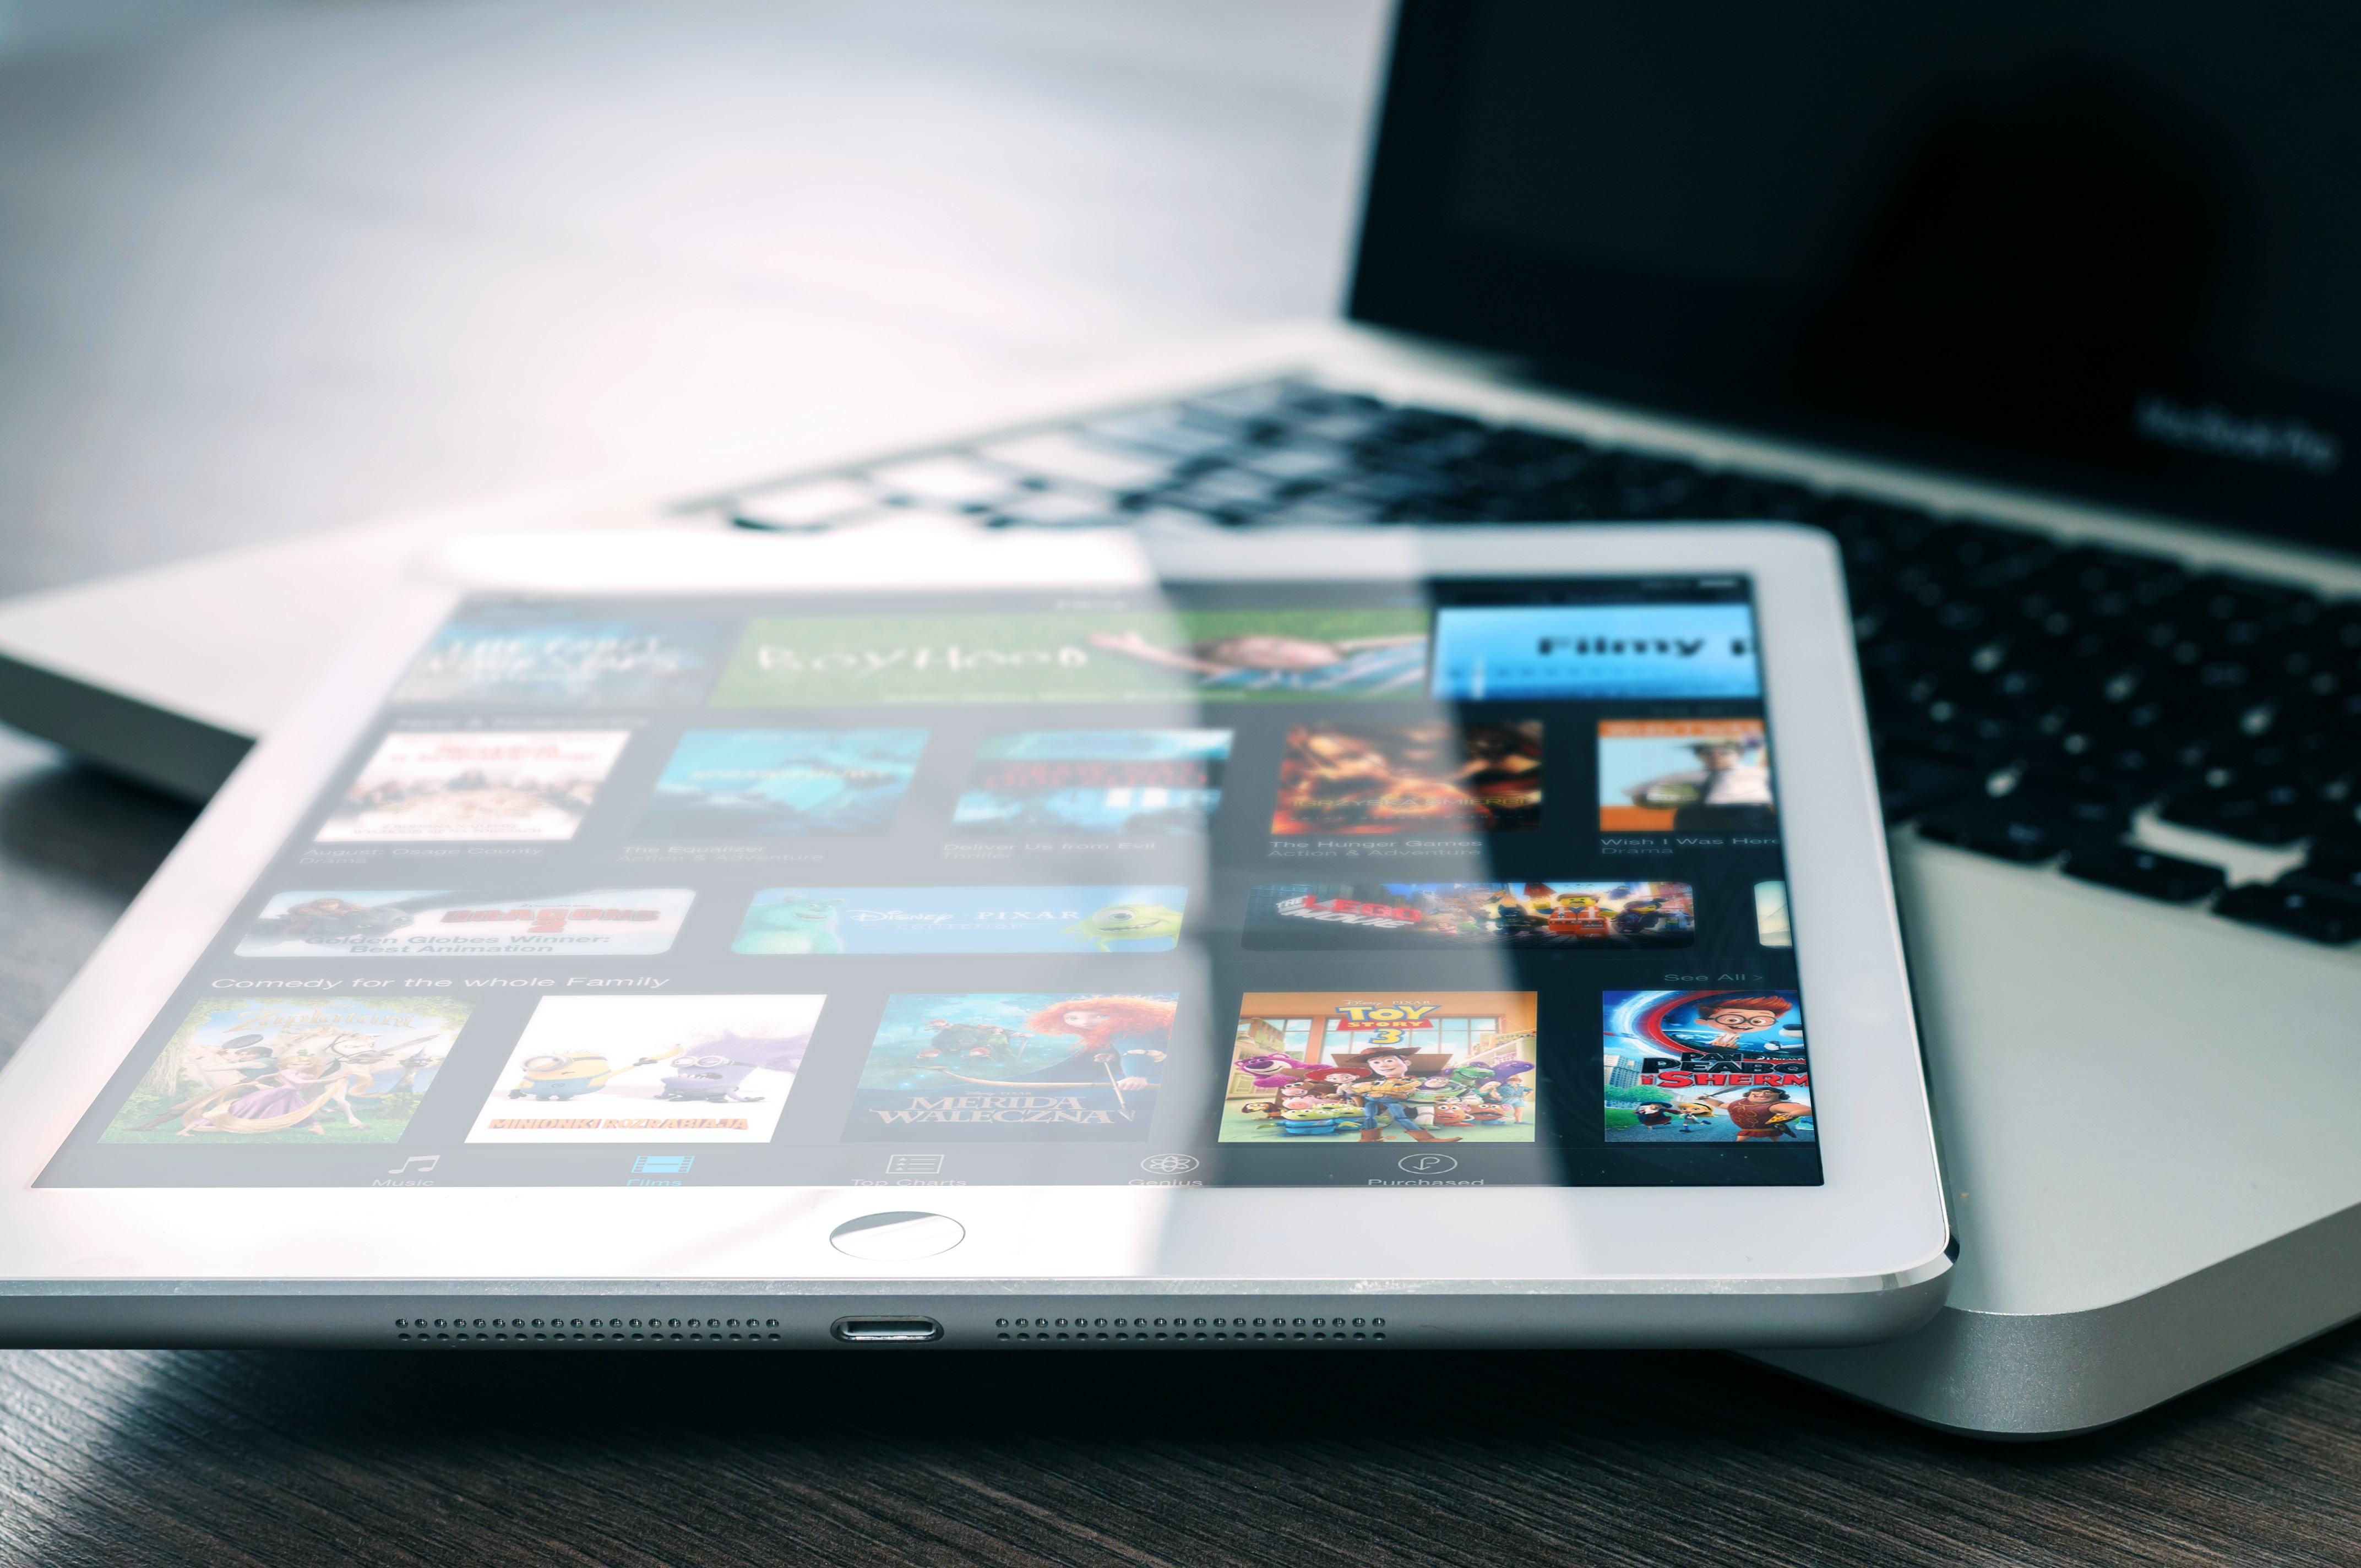 silver iPad on top of MacBook Pro